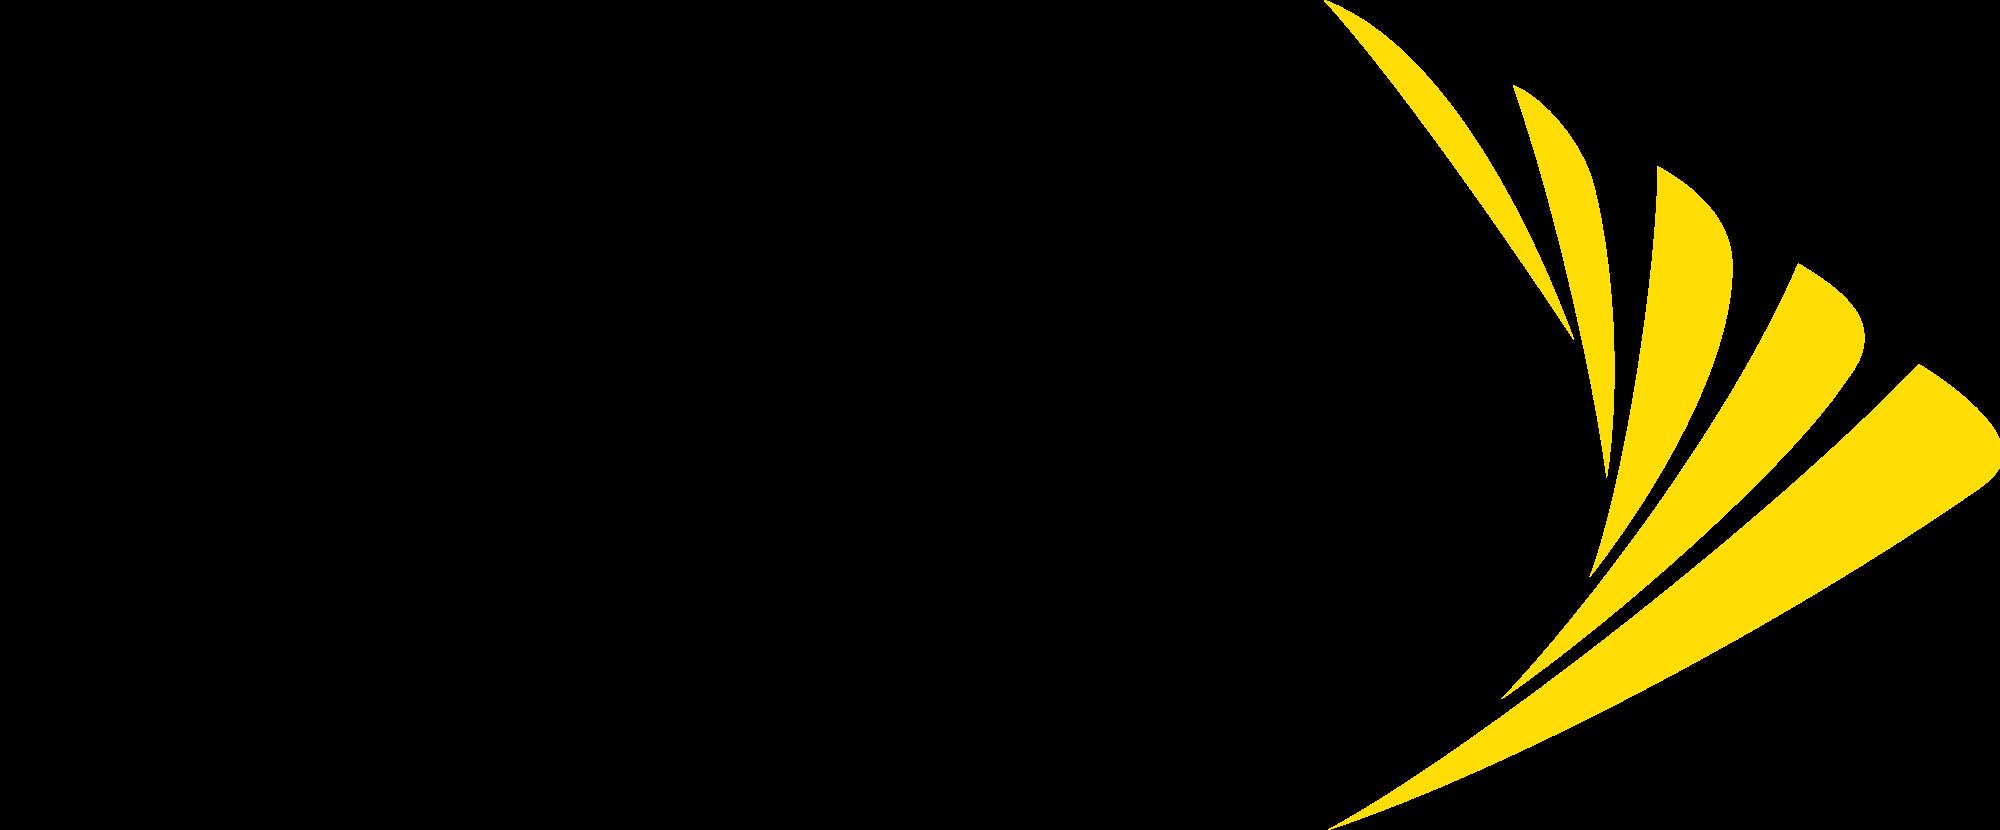 2000px-Logo_of_Sprint_Nextel.png